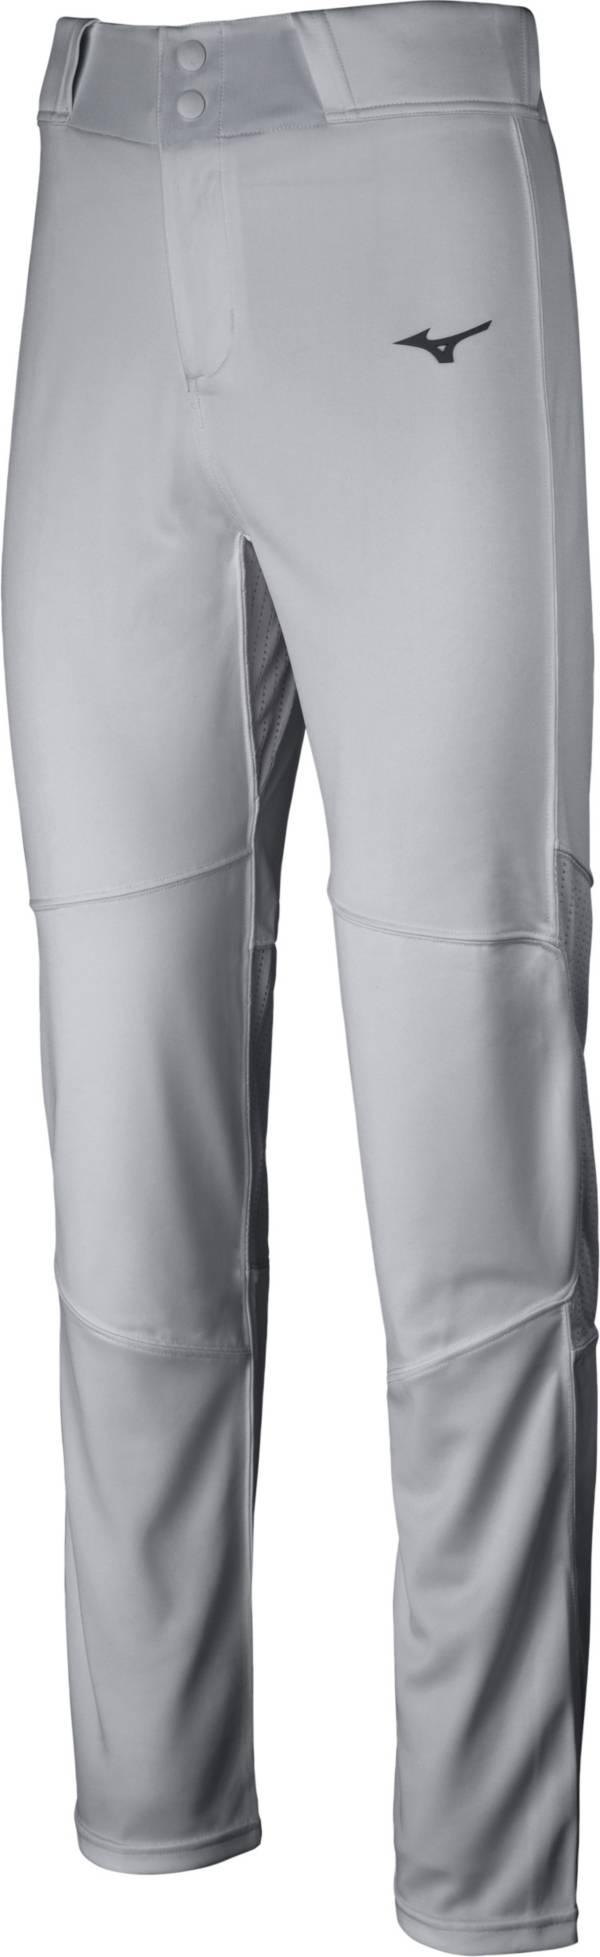 Mizuno Men's Aero Vent Baseball Pants product image